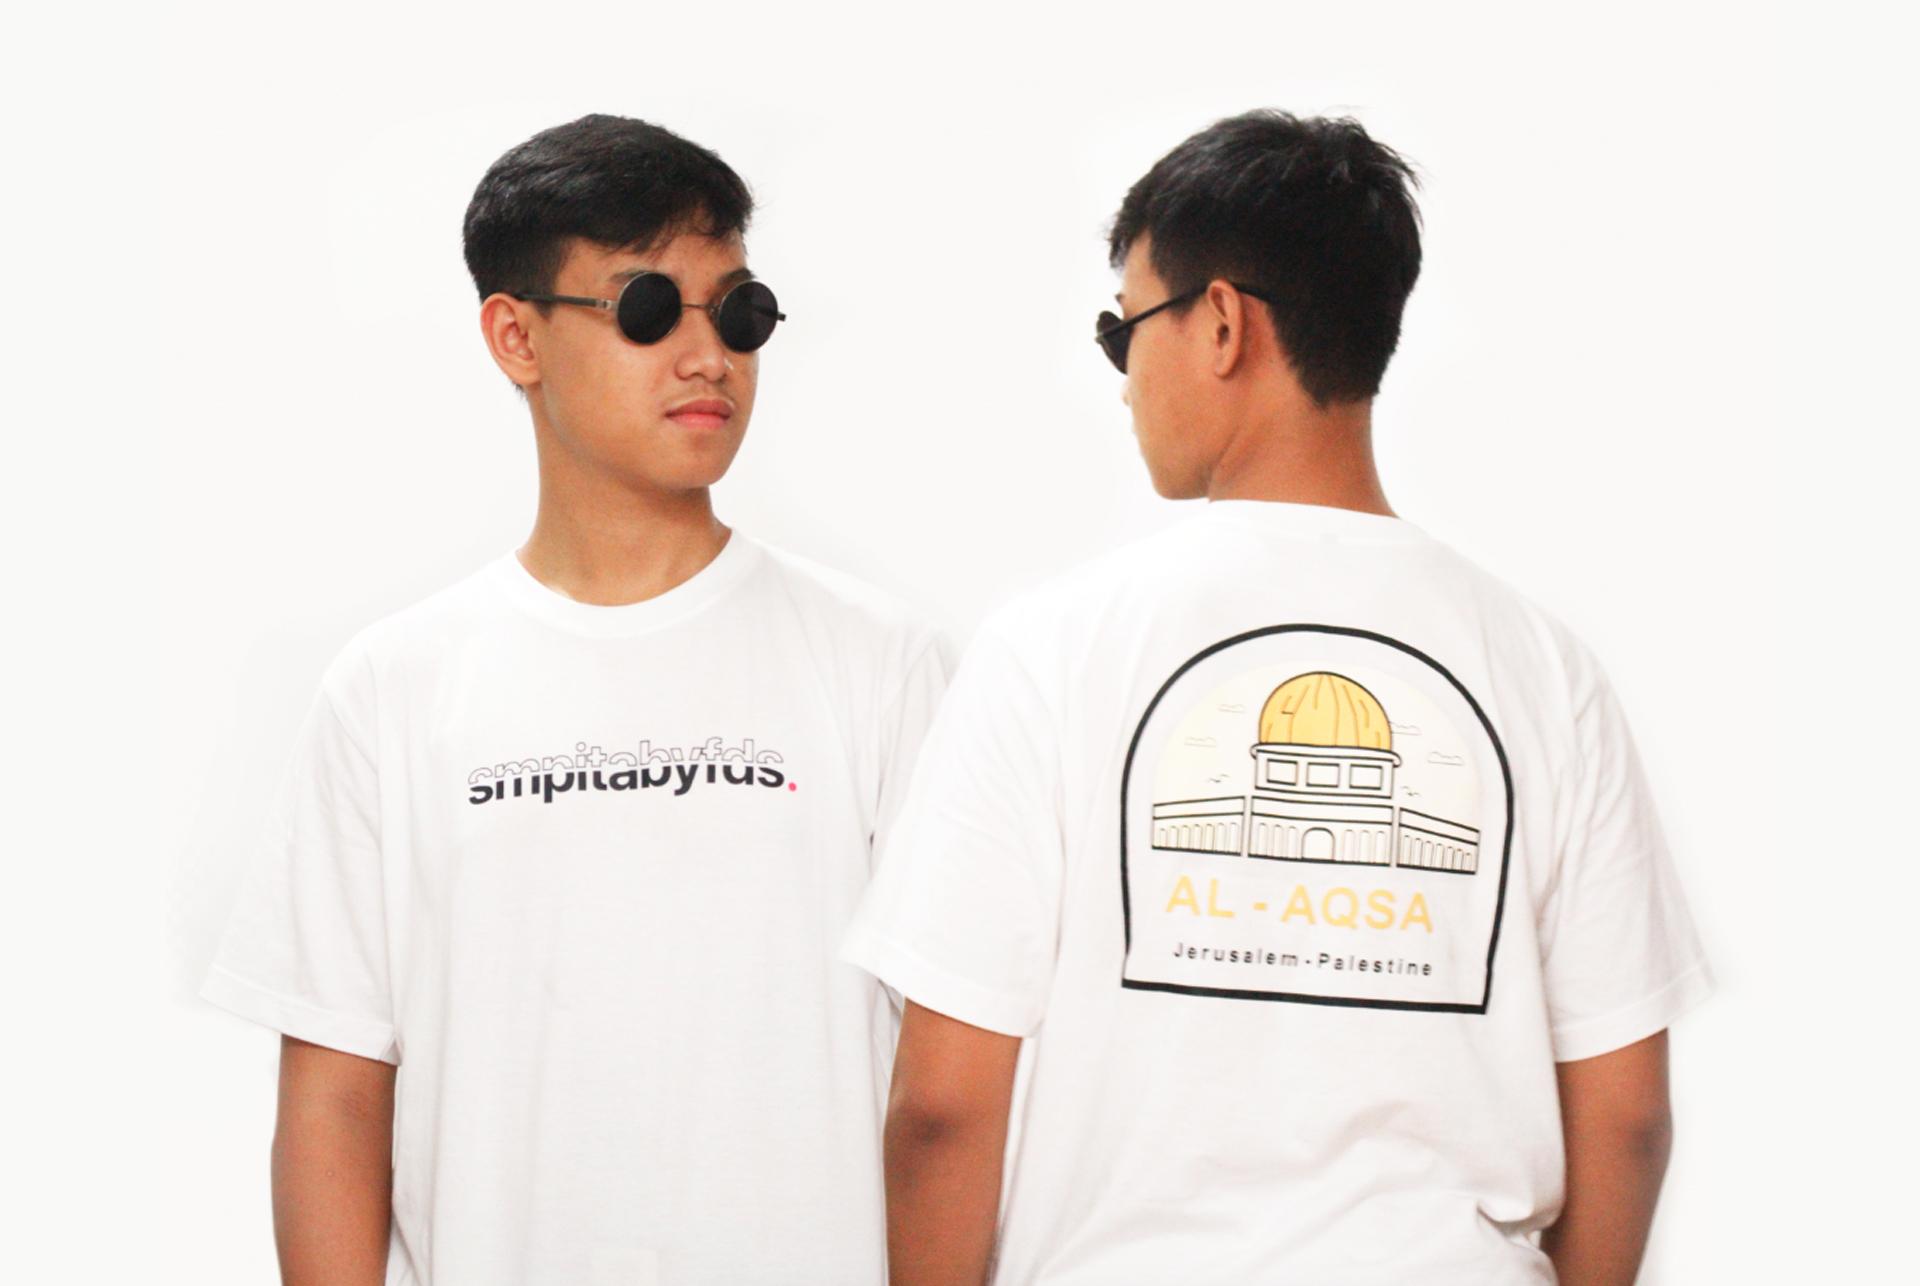 Desain Kaos Al Aqsa SMPITABYFDS karya Bintang Putra Pratama Mockup